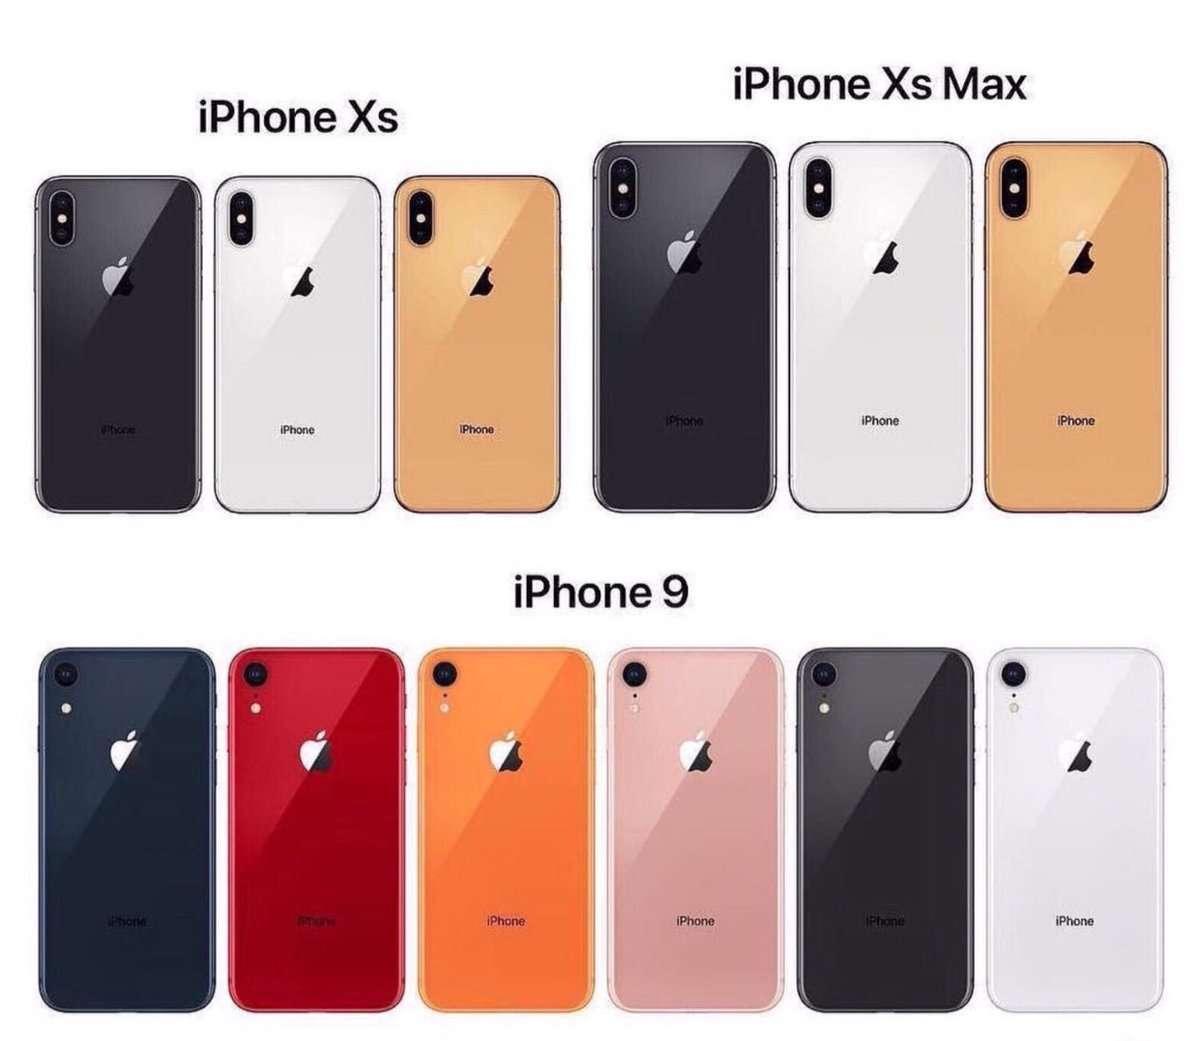 Photo of صور ايفون 9 خلال بث مباشر لـ مؤتمر أبل 2018 ايفون xs ايفون xr المعروف Iphone xs iphone xr